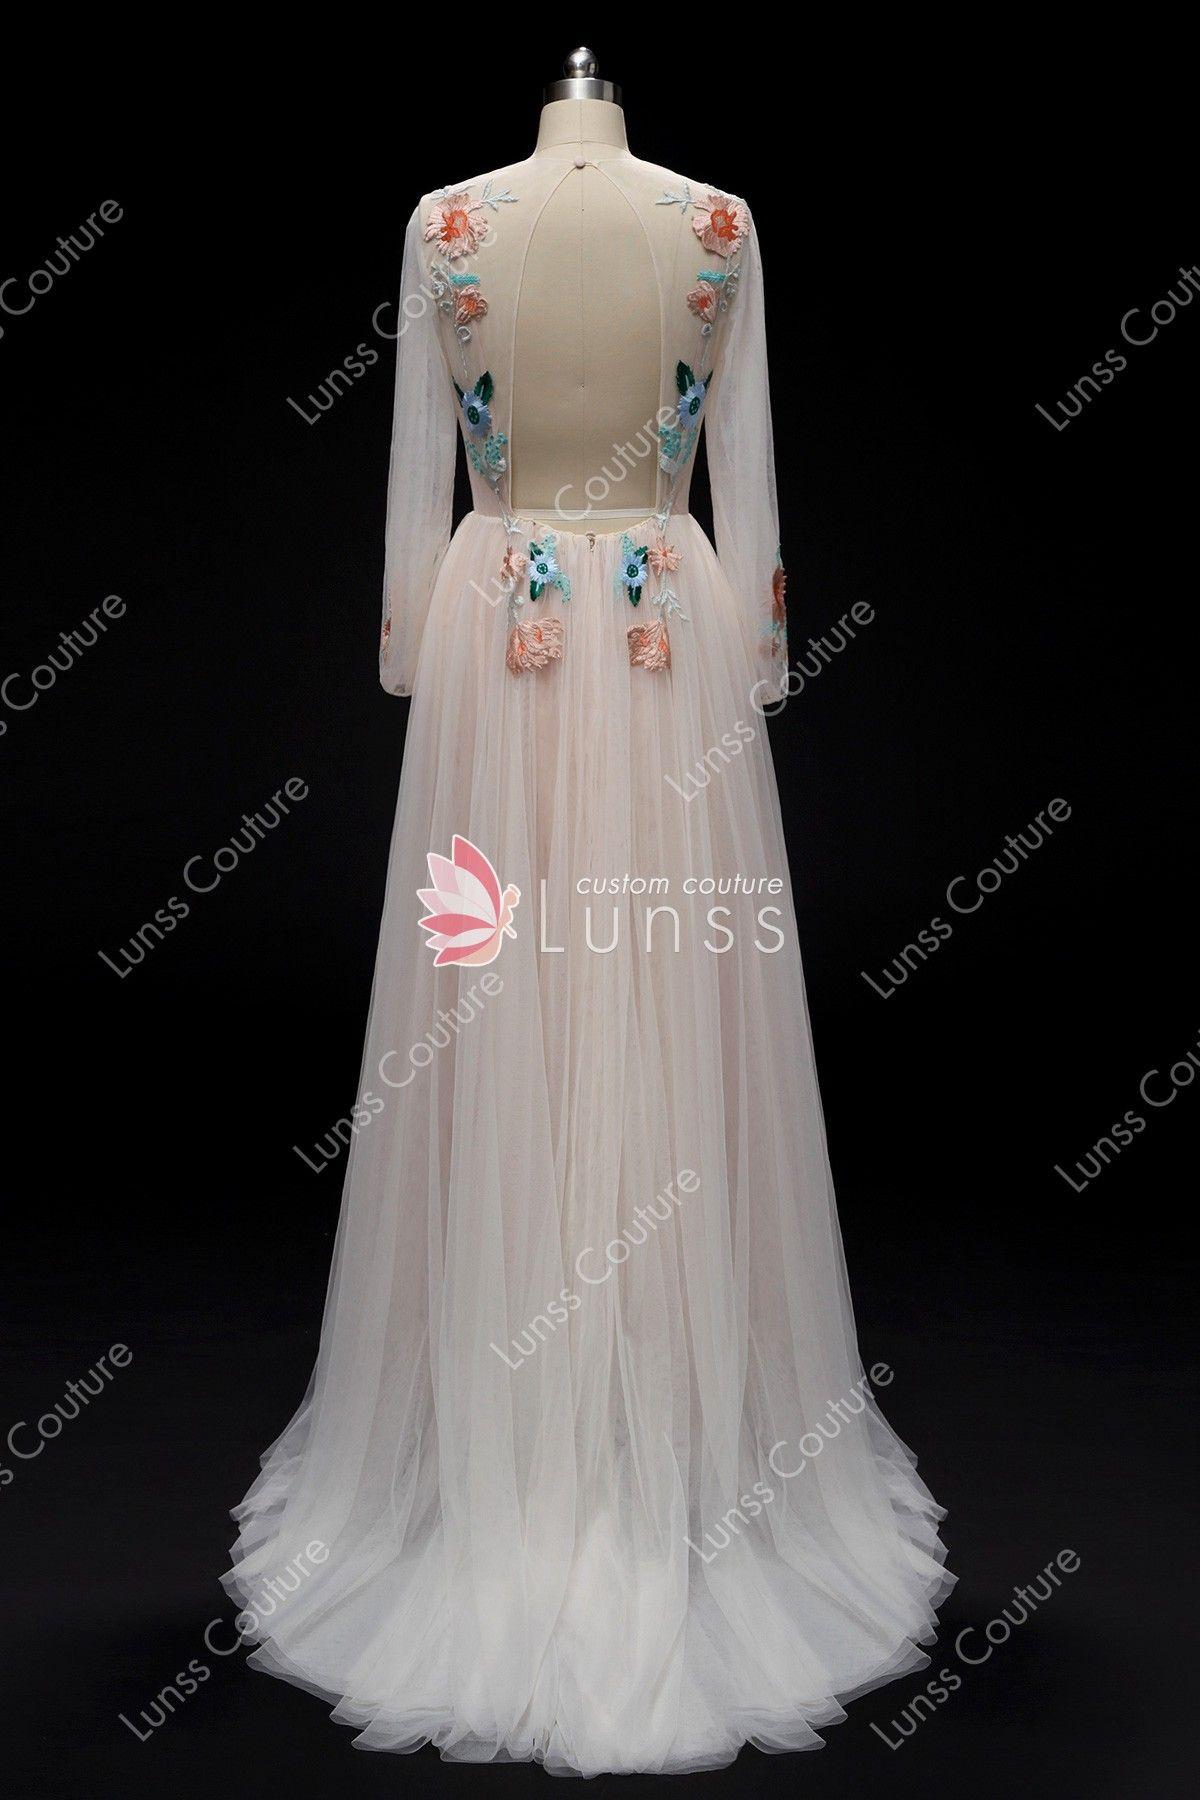 Vintage Pink Sleeved Embroidery Long Wedding Dress Long Wedding Dresses Dresses Tiered Wedding Dress [ 1800 x 1200 Pixel ]